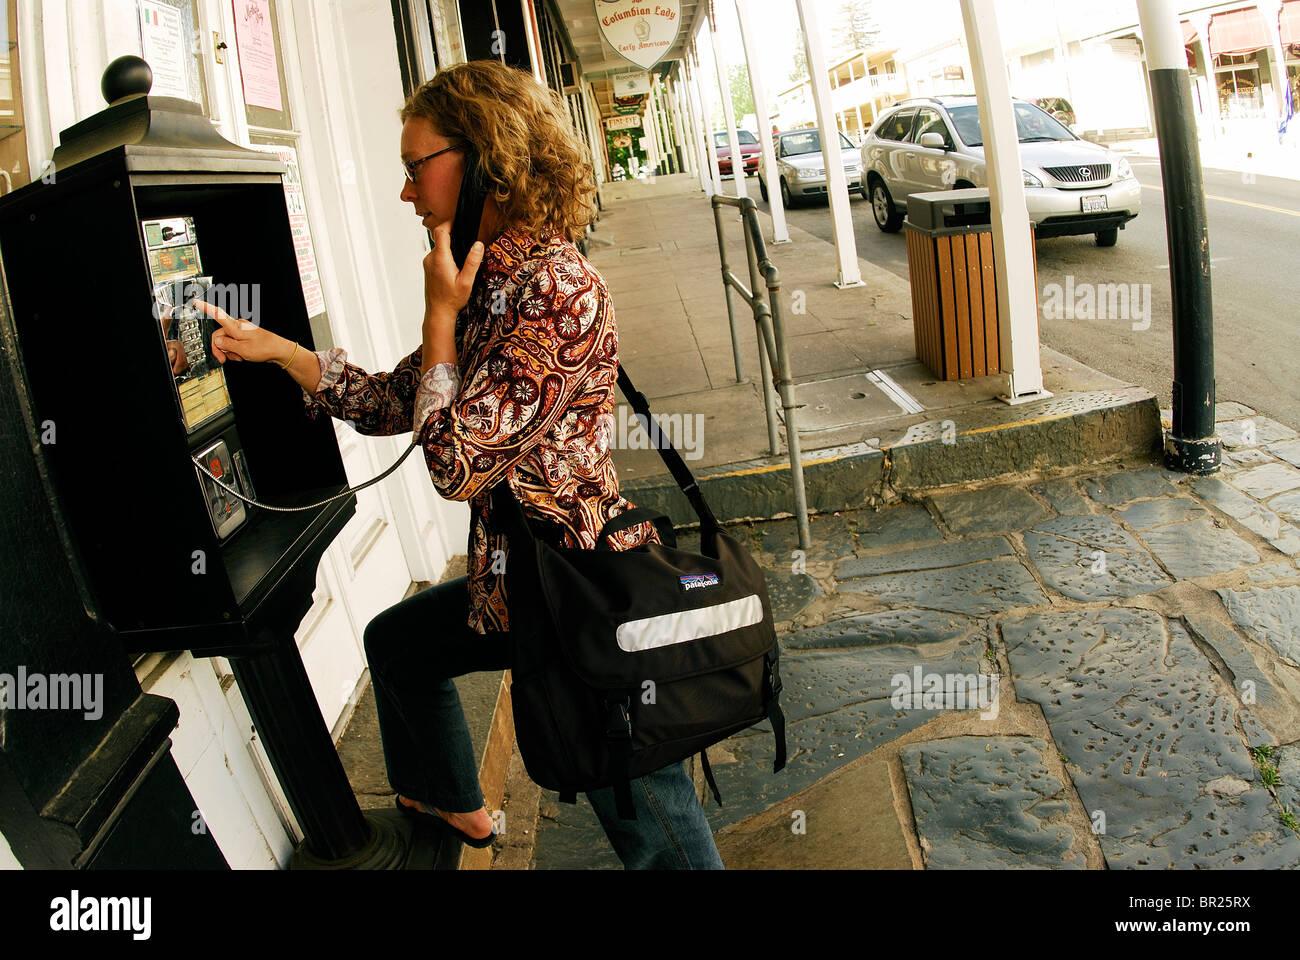 Woman makes a phone call. Springfield, California, USA - Stock Image